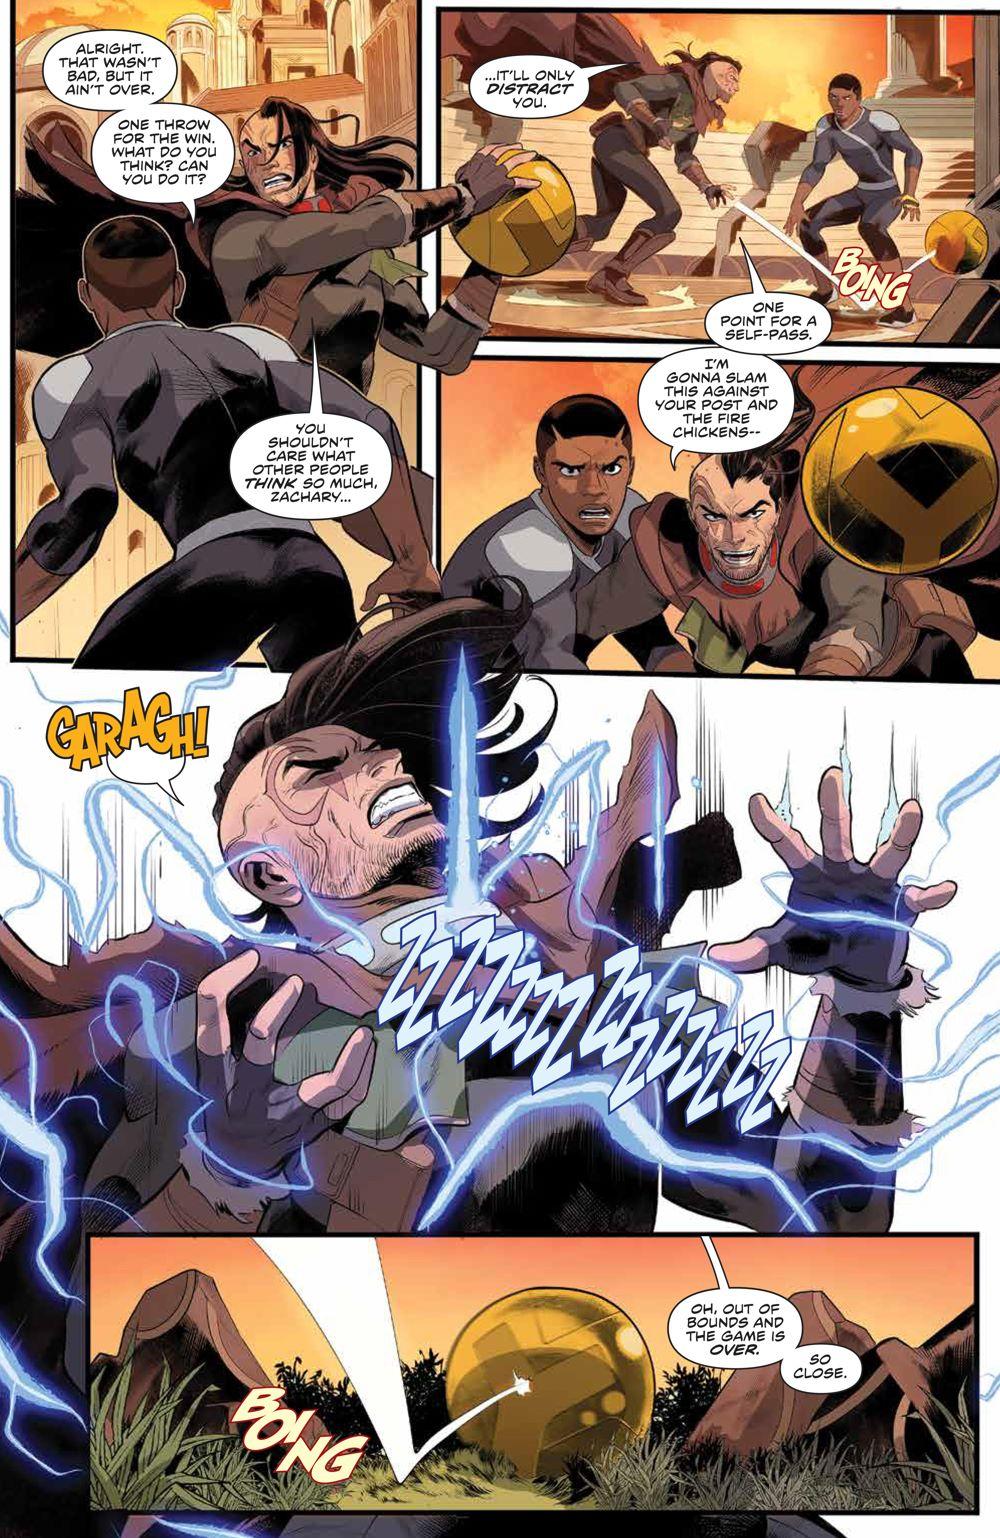 PowerRangers_007_PRESS_5 ComicList Previews: POWER RANGERS #7